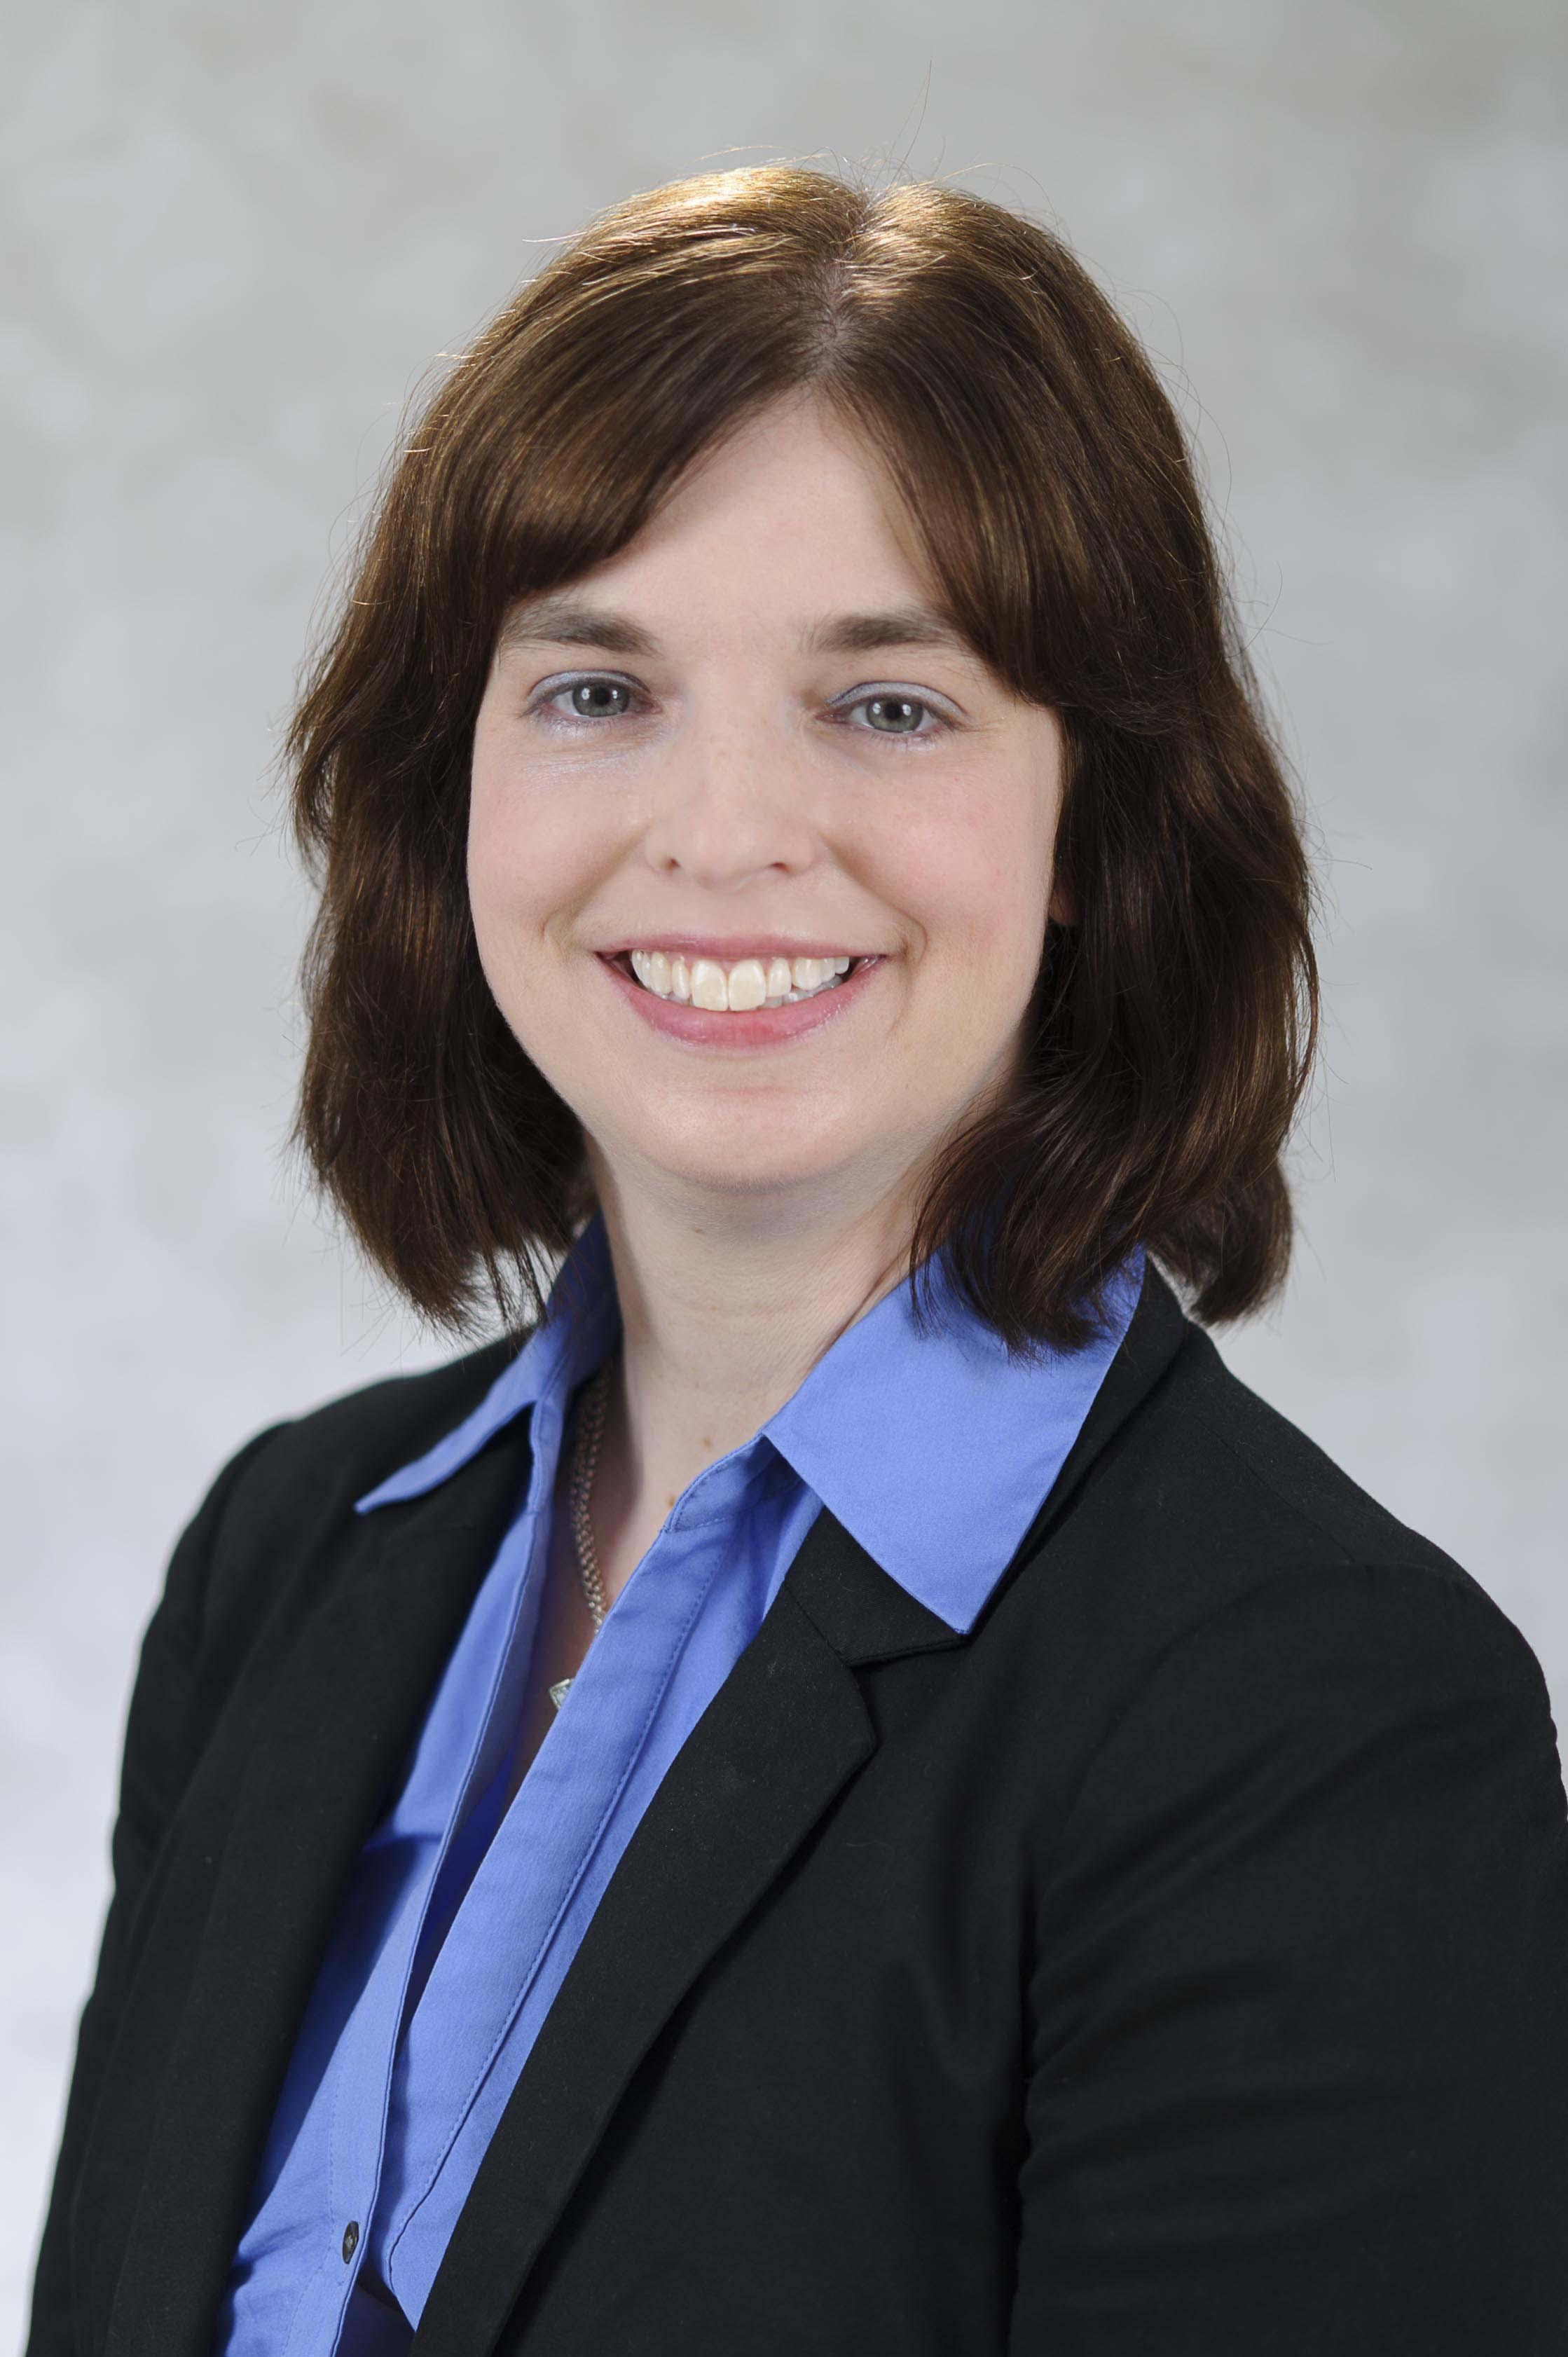 Heather Hylton